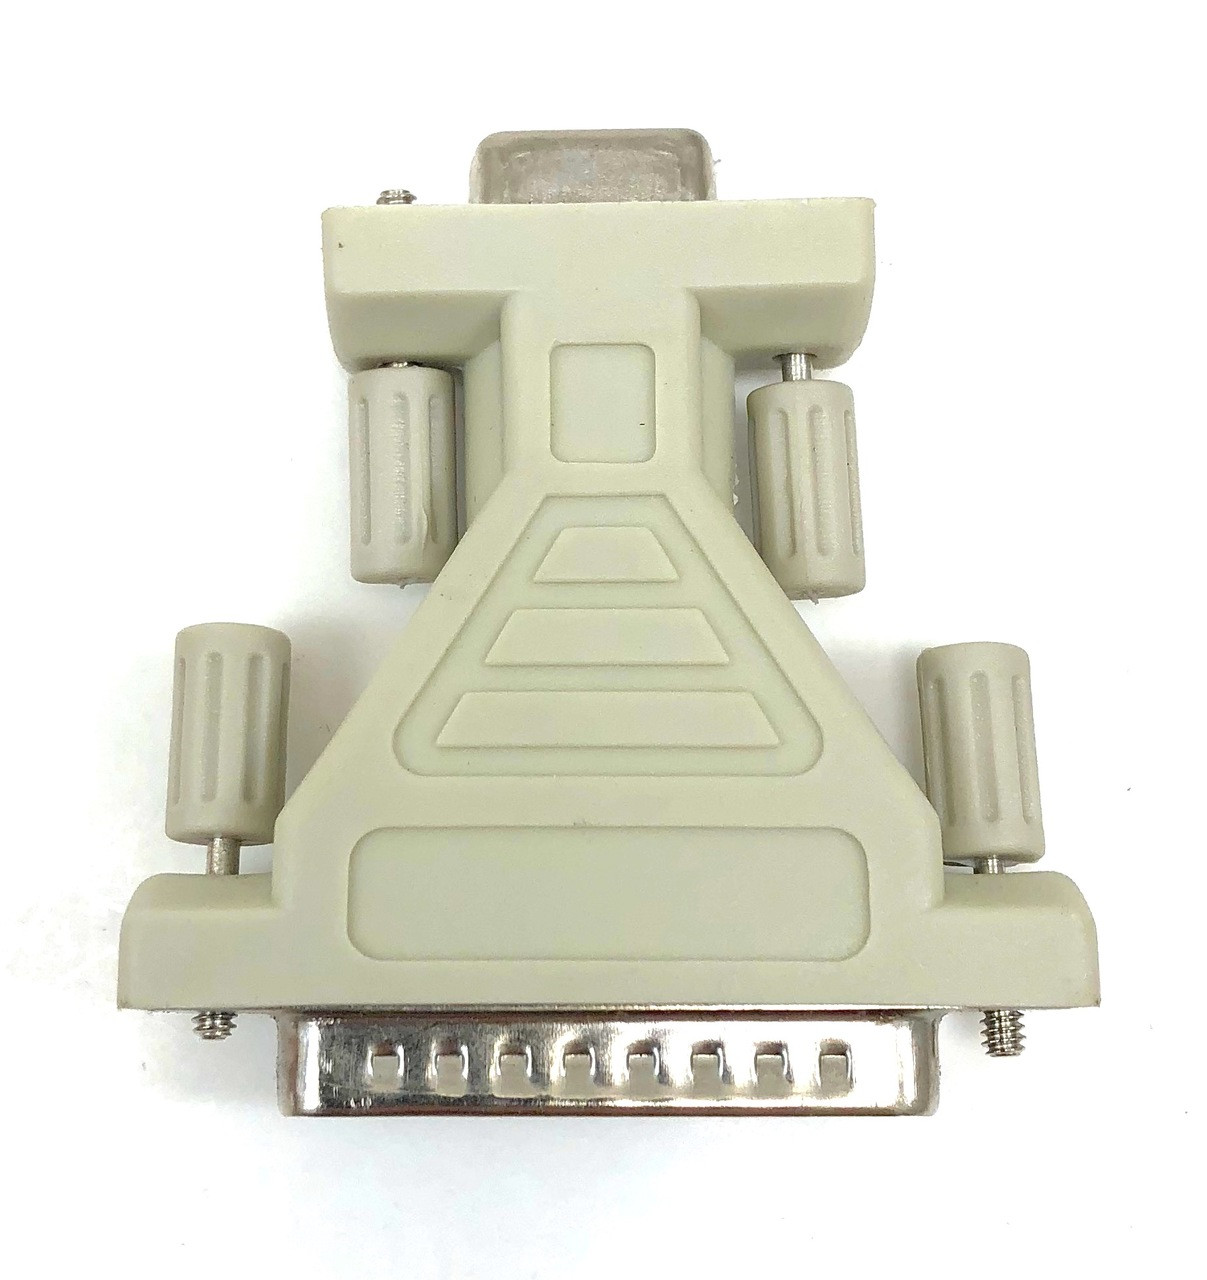 Serial Adapter (DB9F to DB25M)